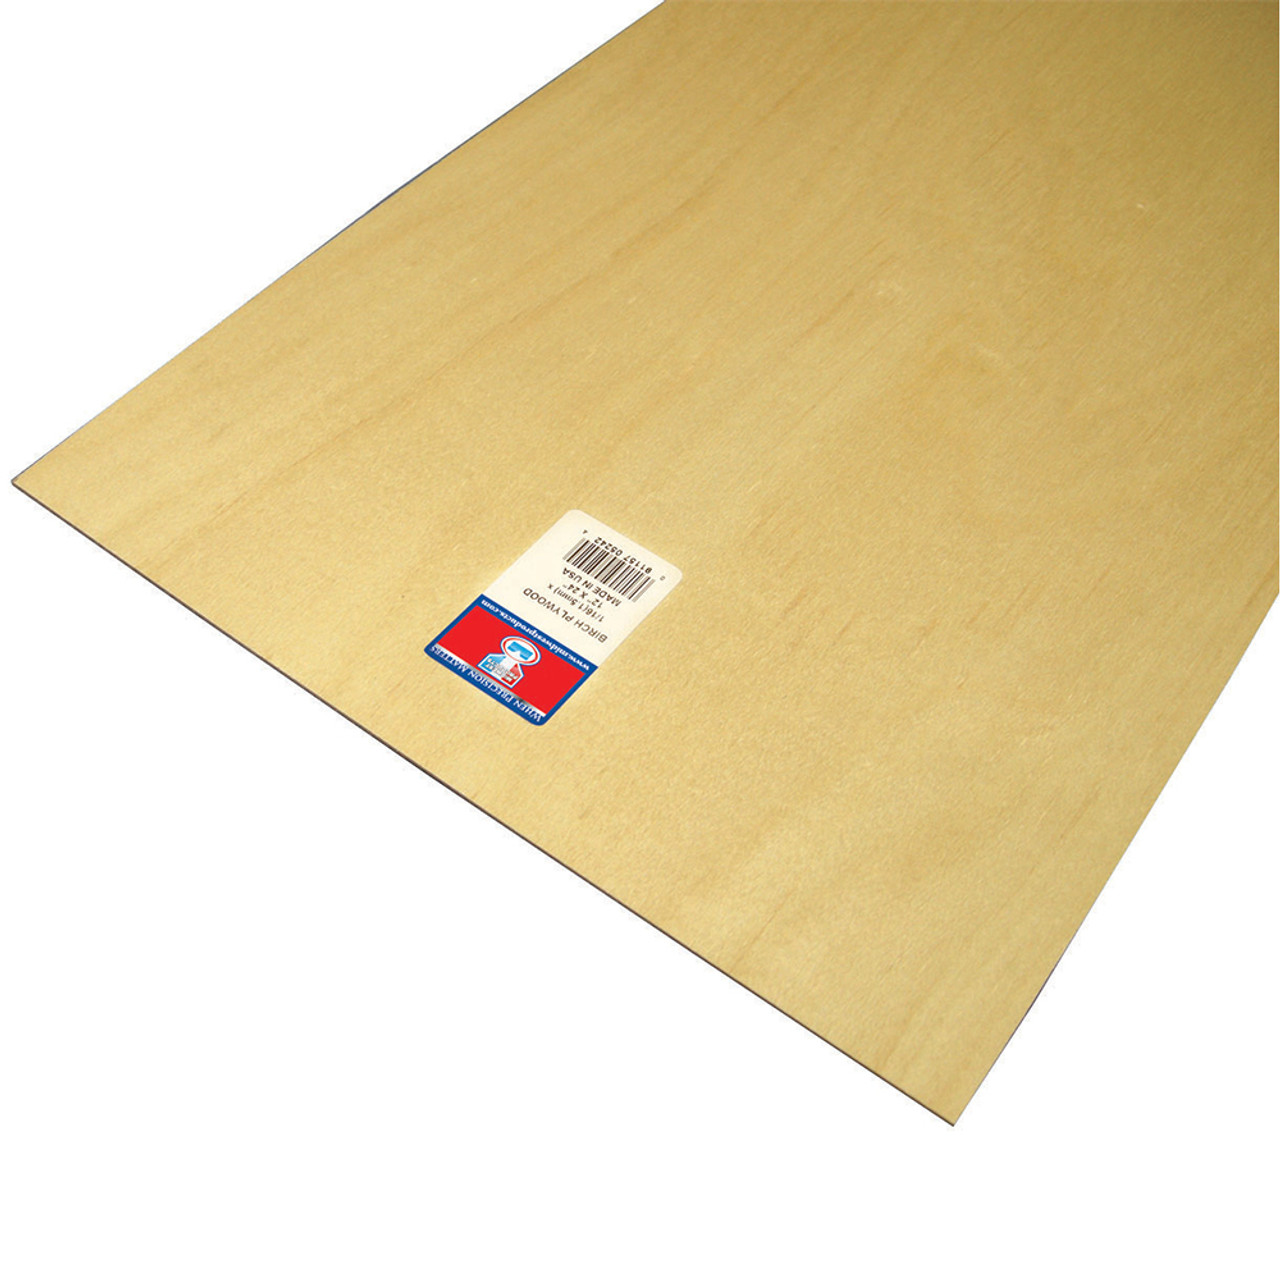 "Aircraft Grade Birch Thin Plywood Sheet .06"" x 12"" x 24"""